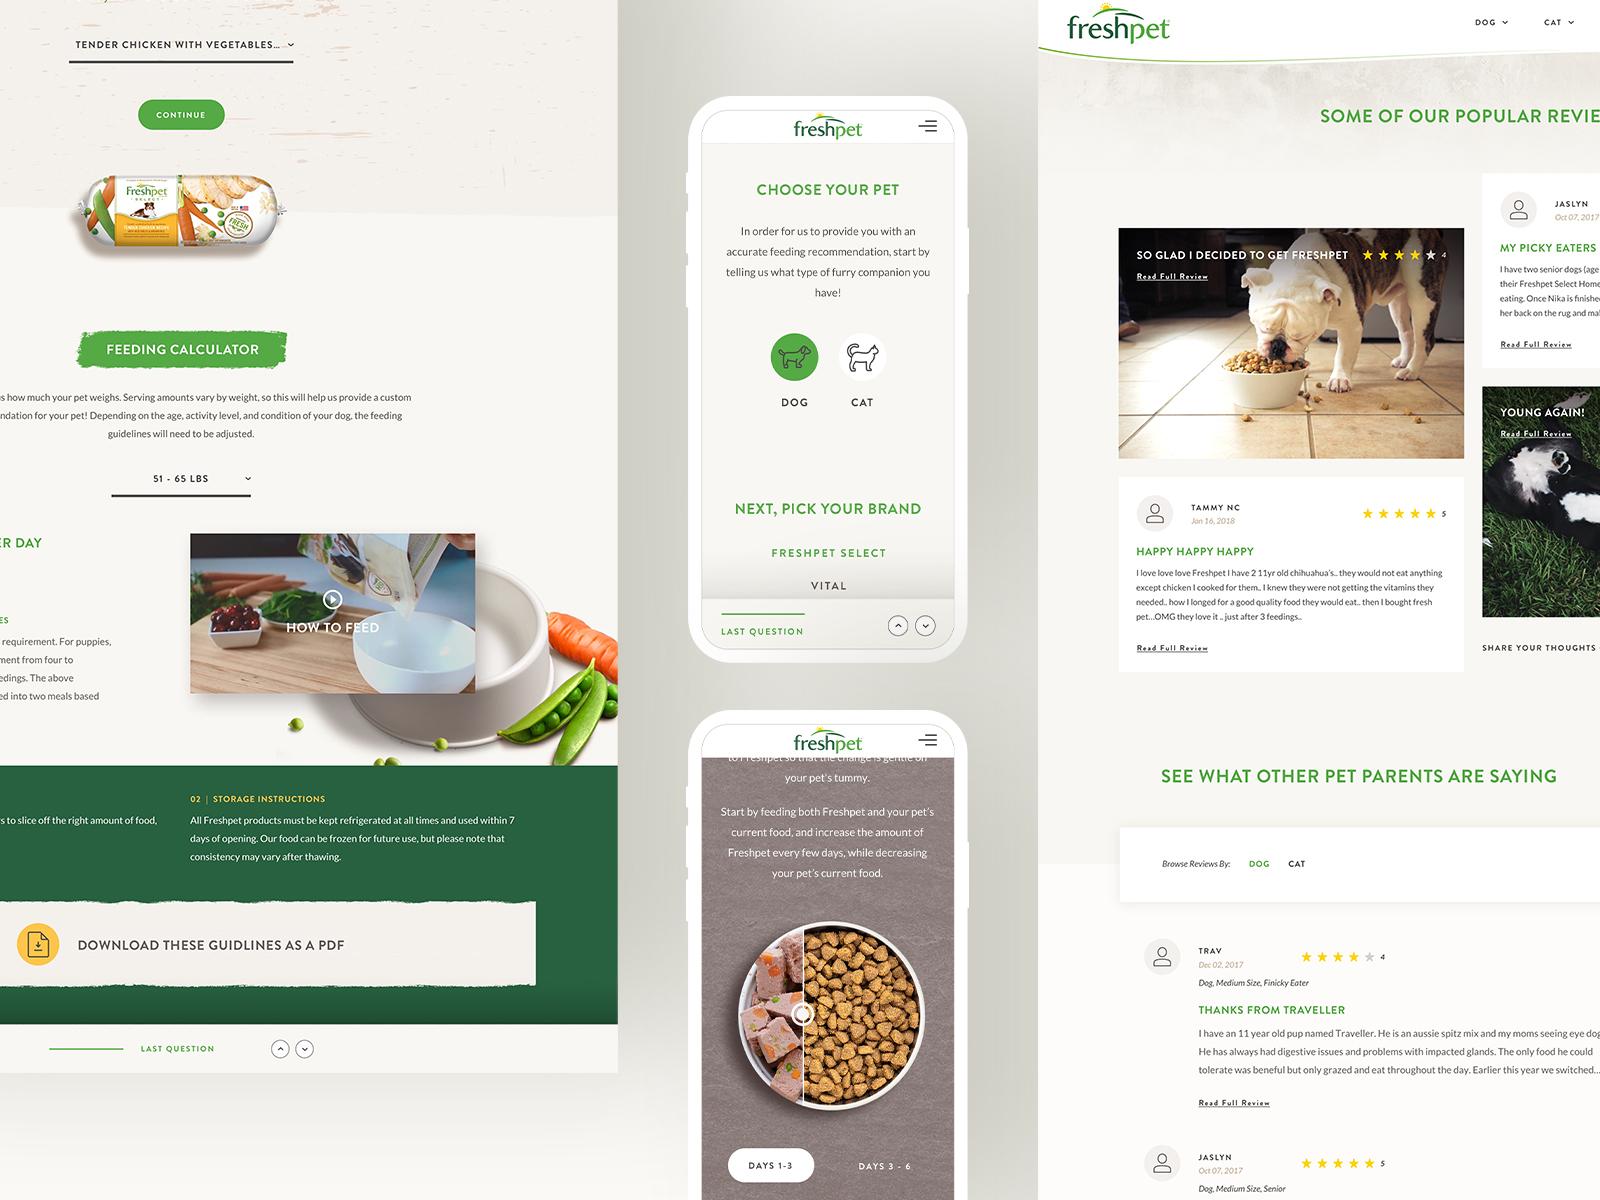 Freshpet redesign